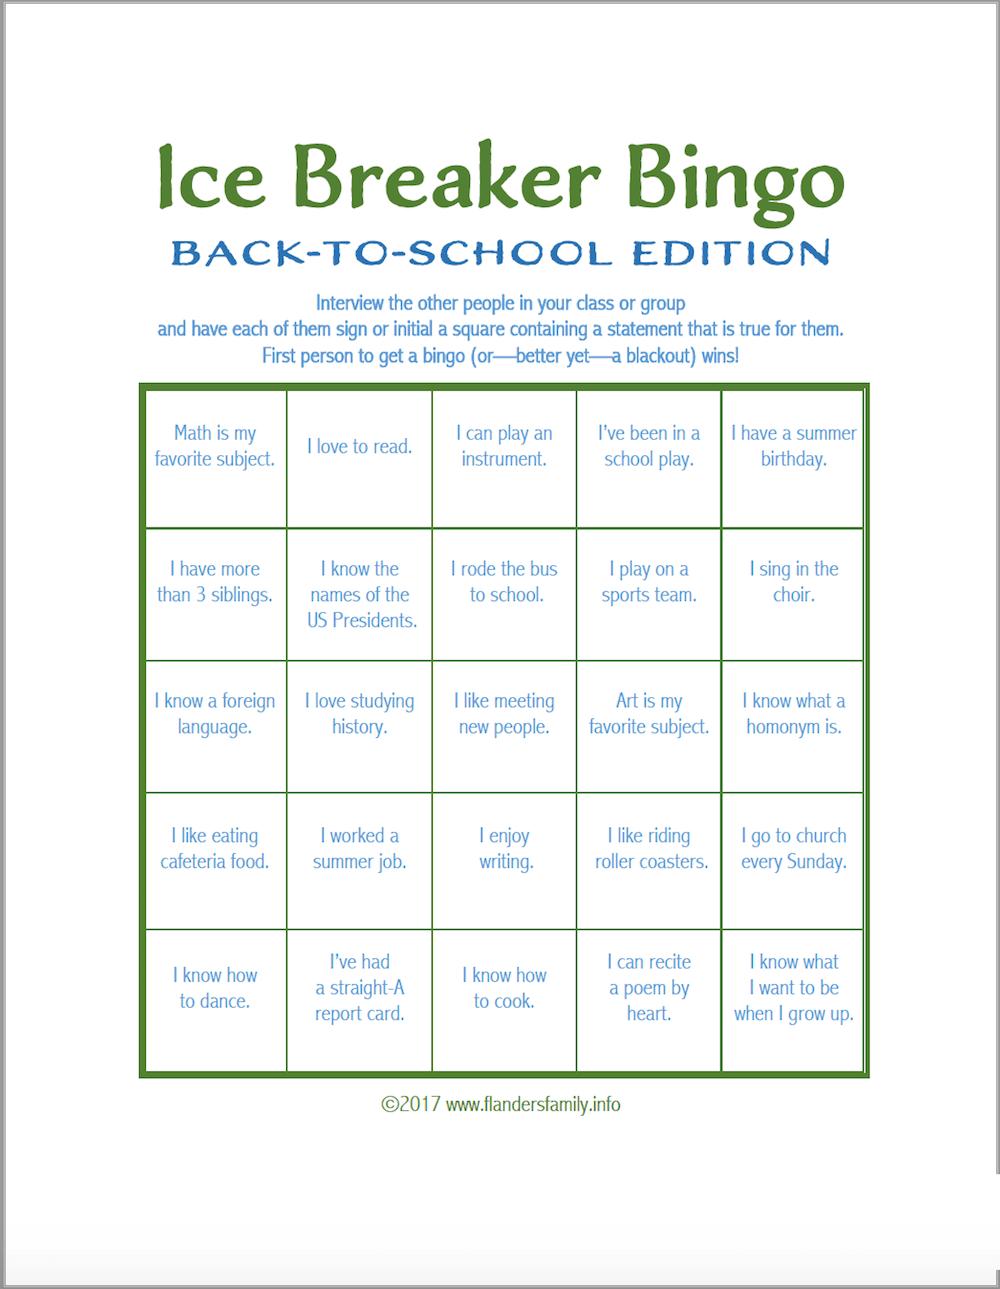 Ice Breaker Bingo Back To School Version Flanders